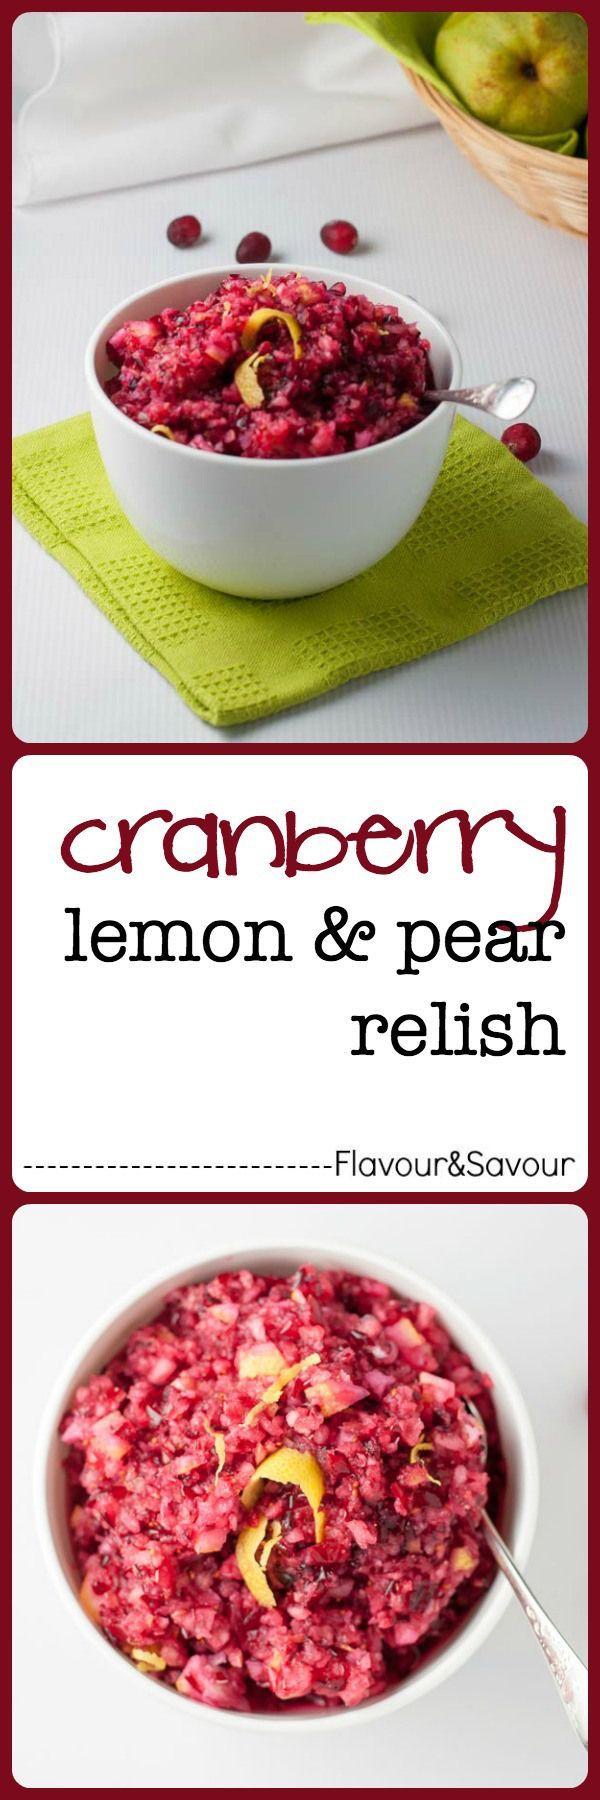 Cranberry Lemon And Pear Relish